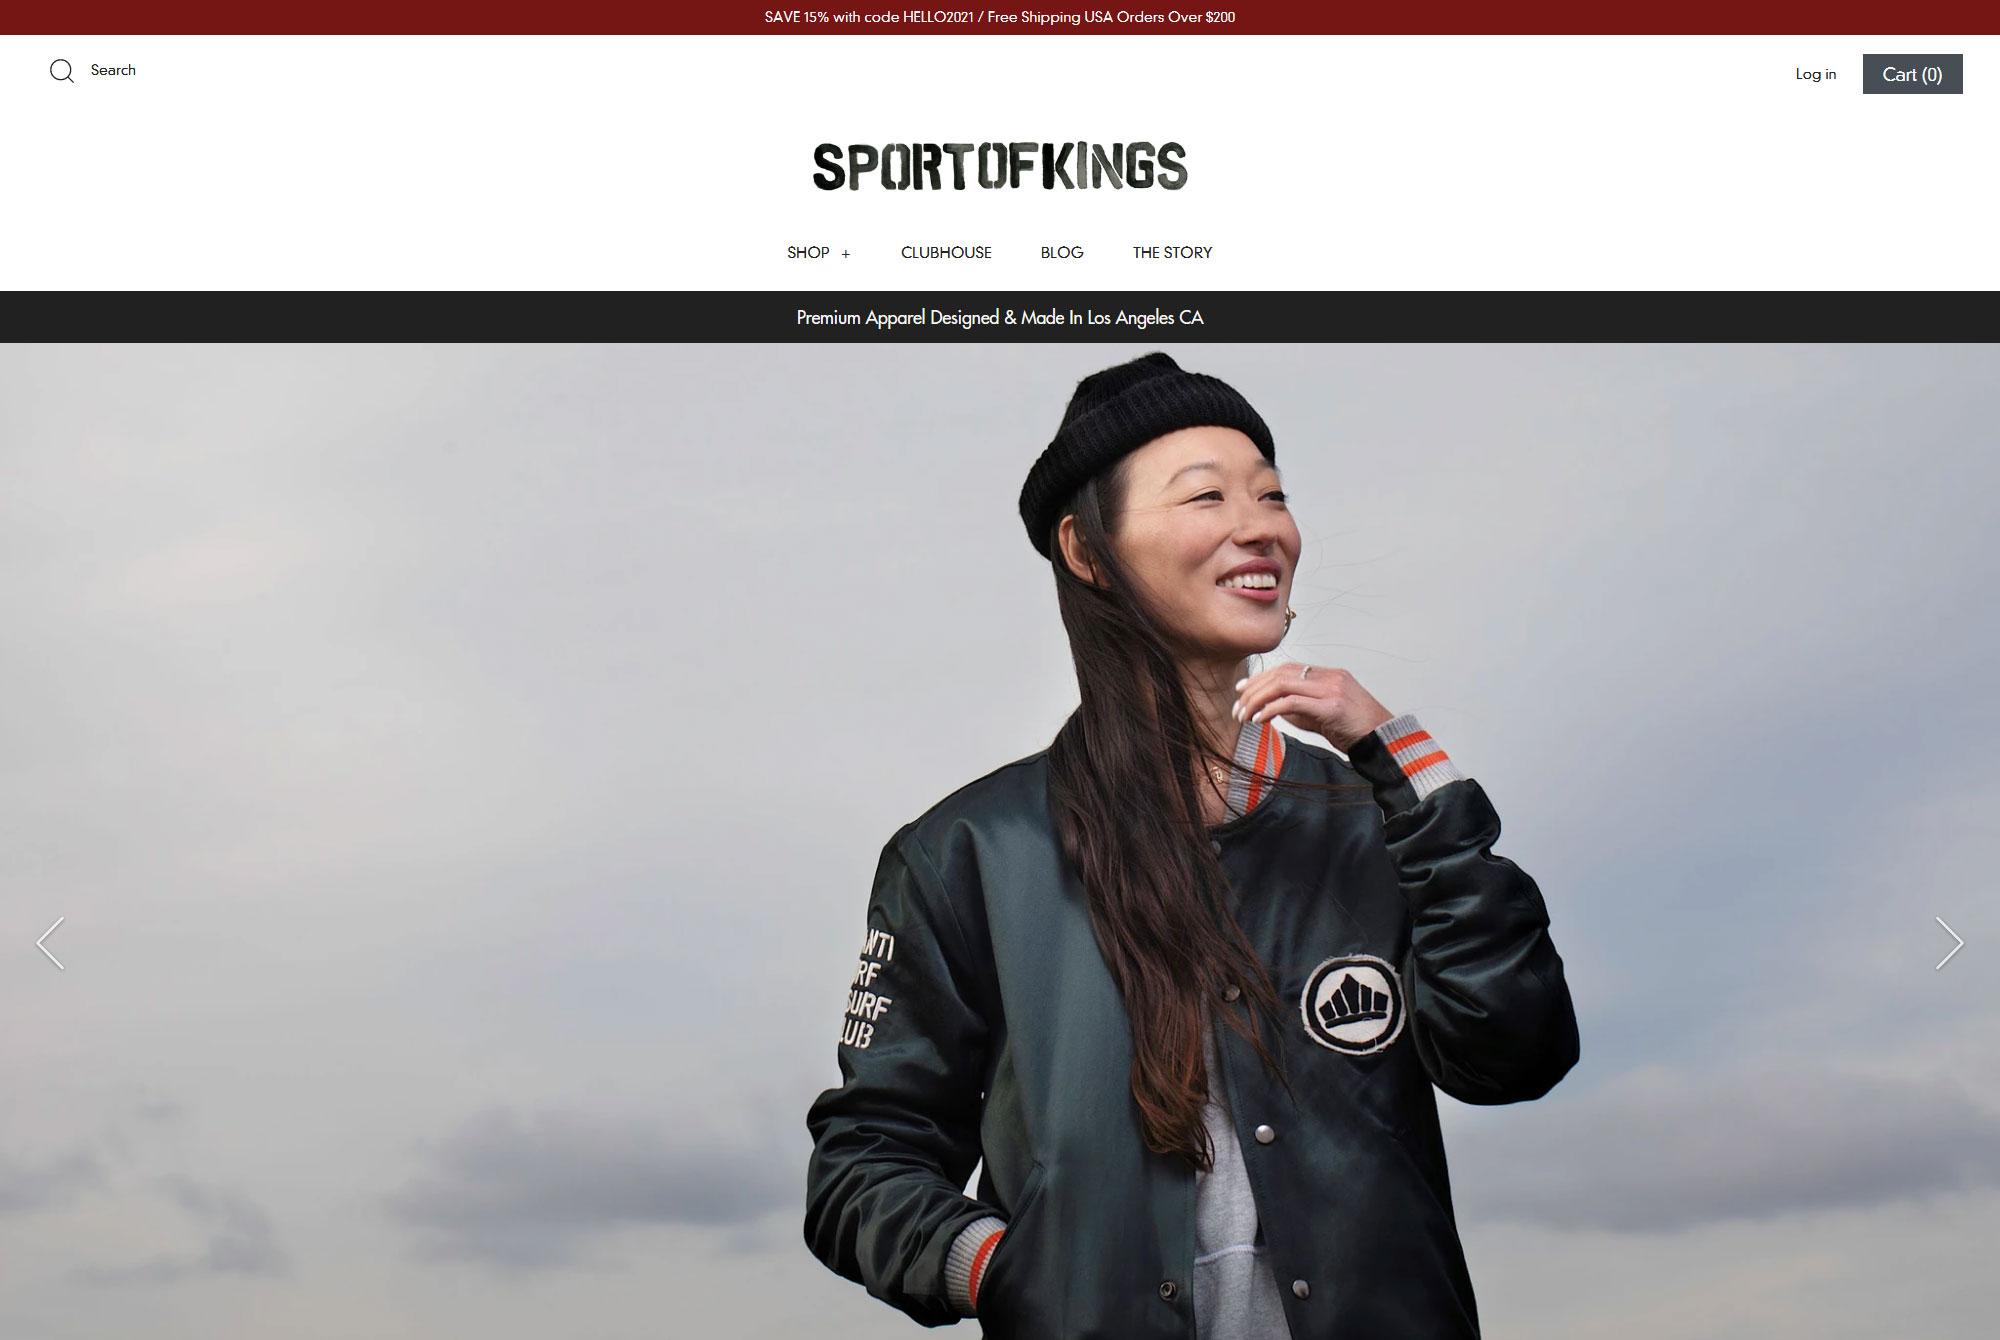 newport beach fashion apparel ecommerce shpoify website development preview